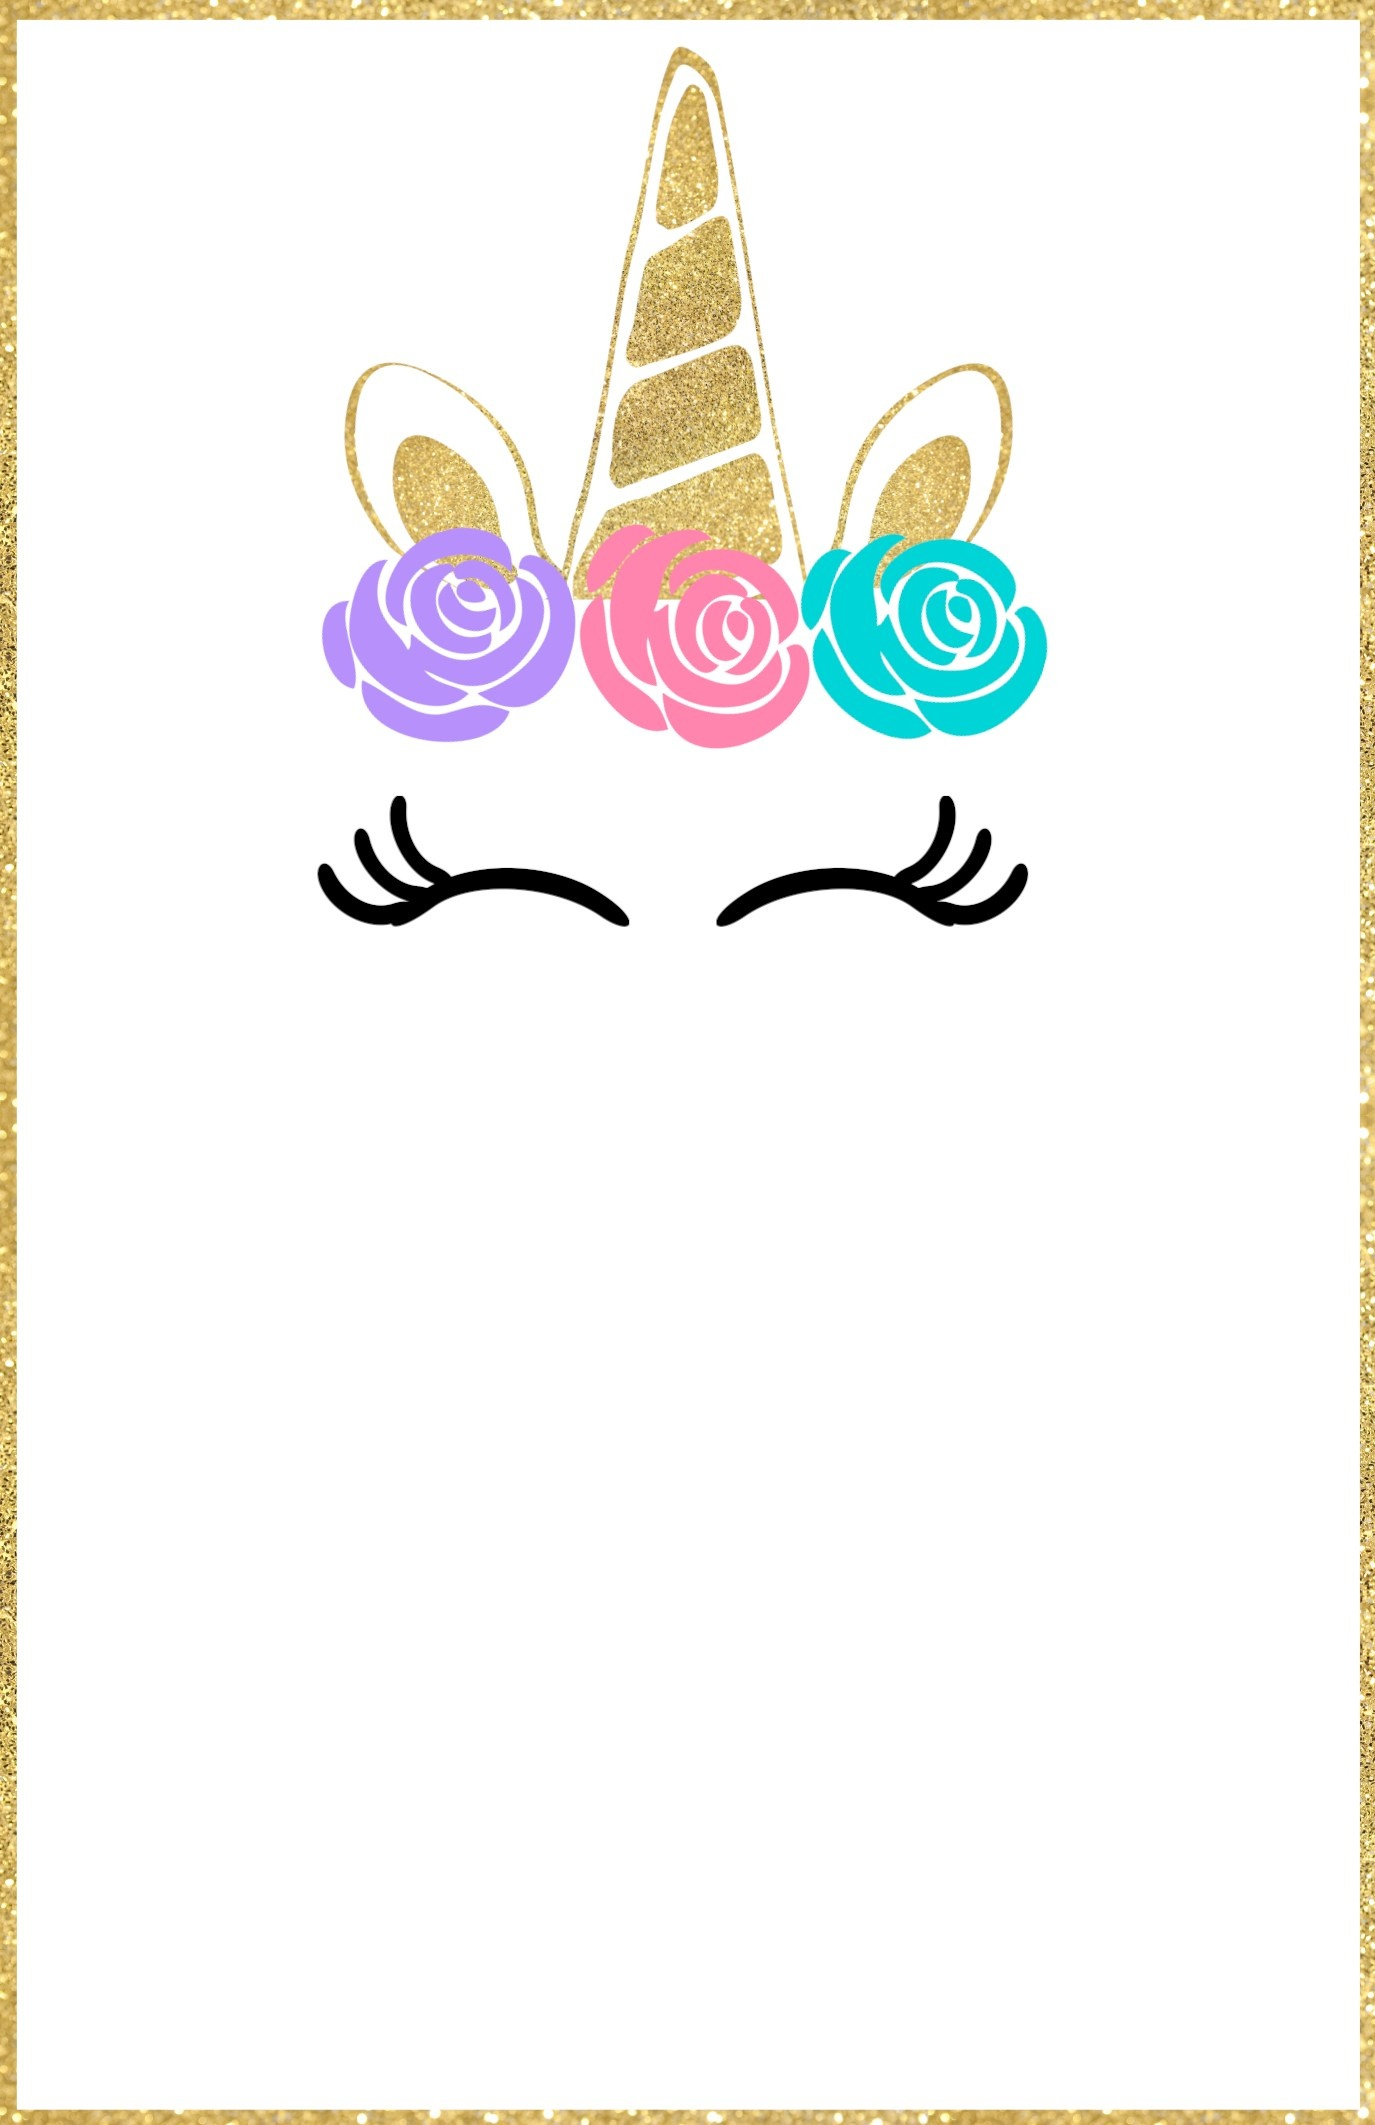 Free Printable Unicorn Invitations Template - Paper Trail Design - Free Printable Party Invitations